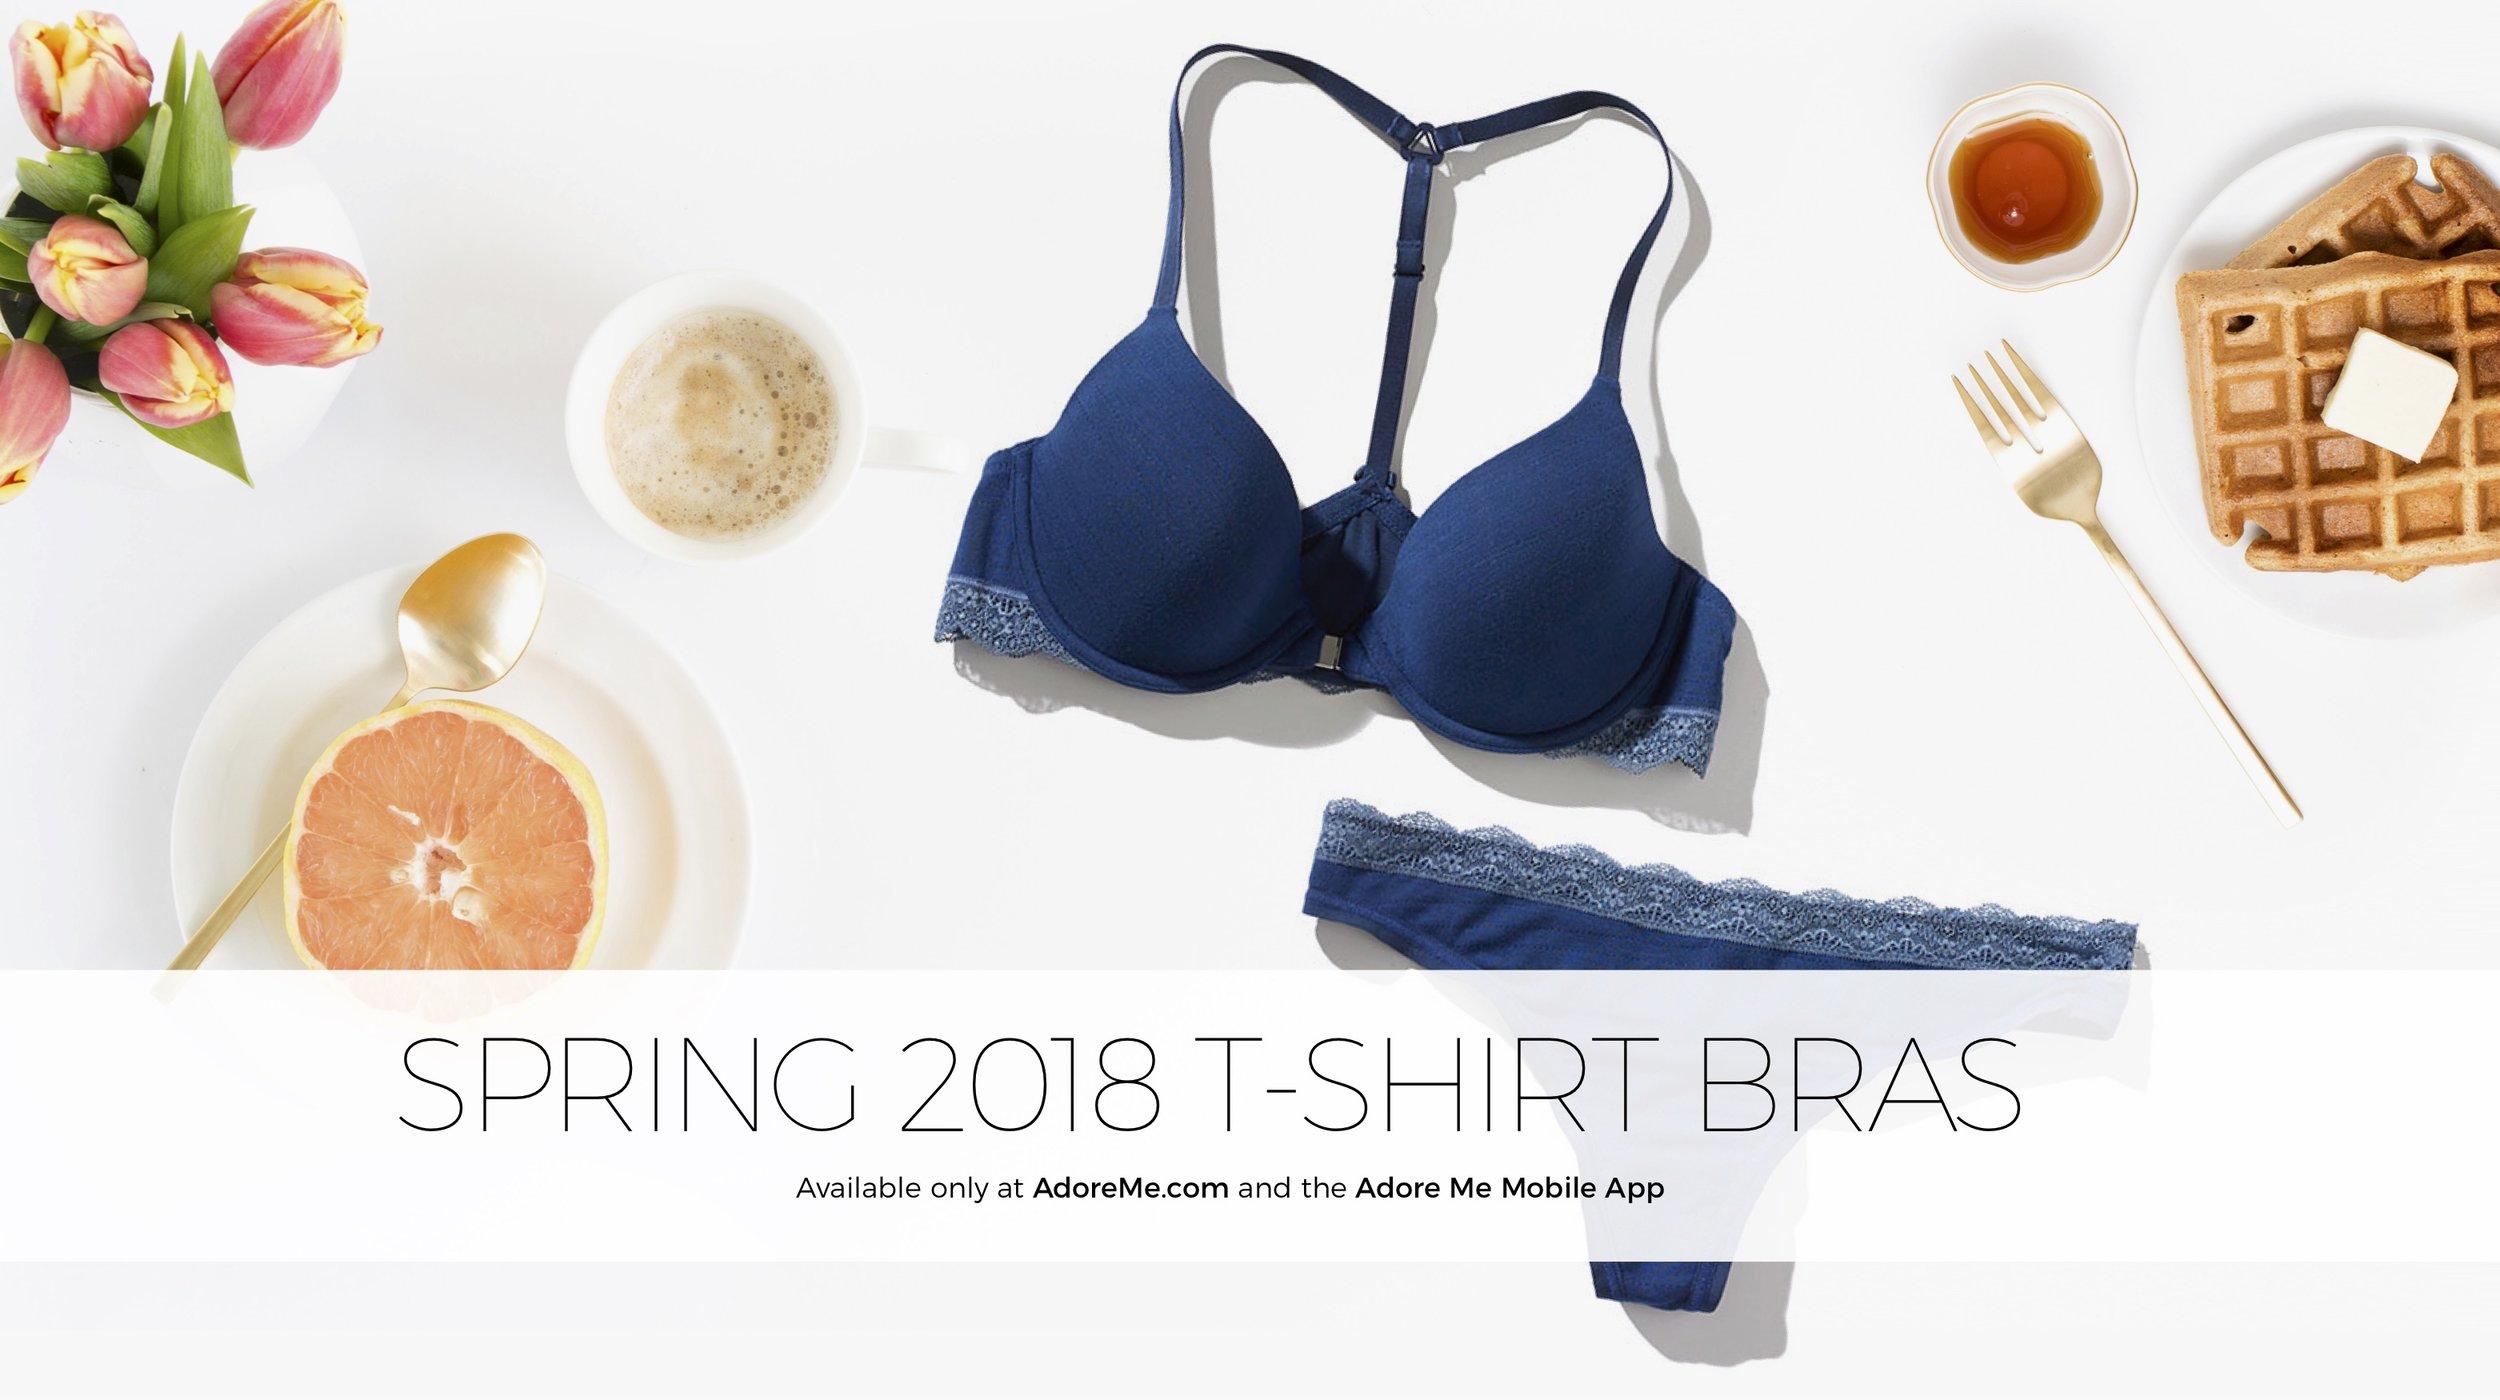 Adore Me Spring 2018 T-shirt Bras 1.jpg